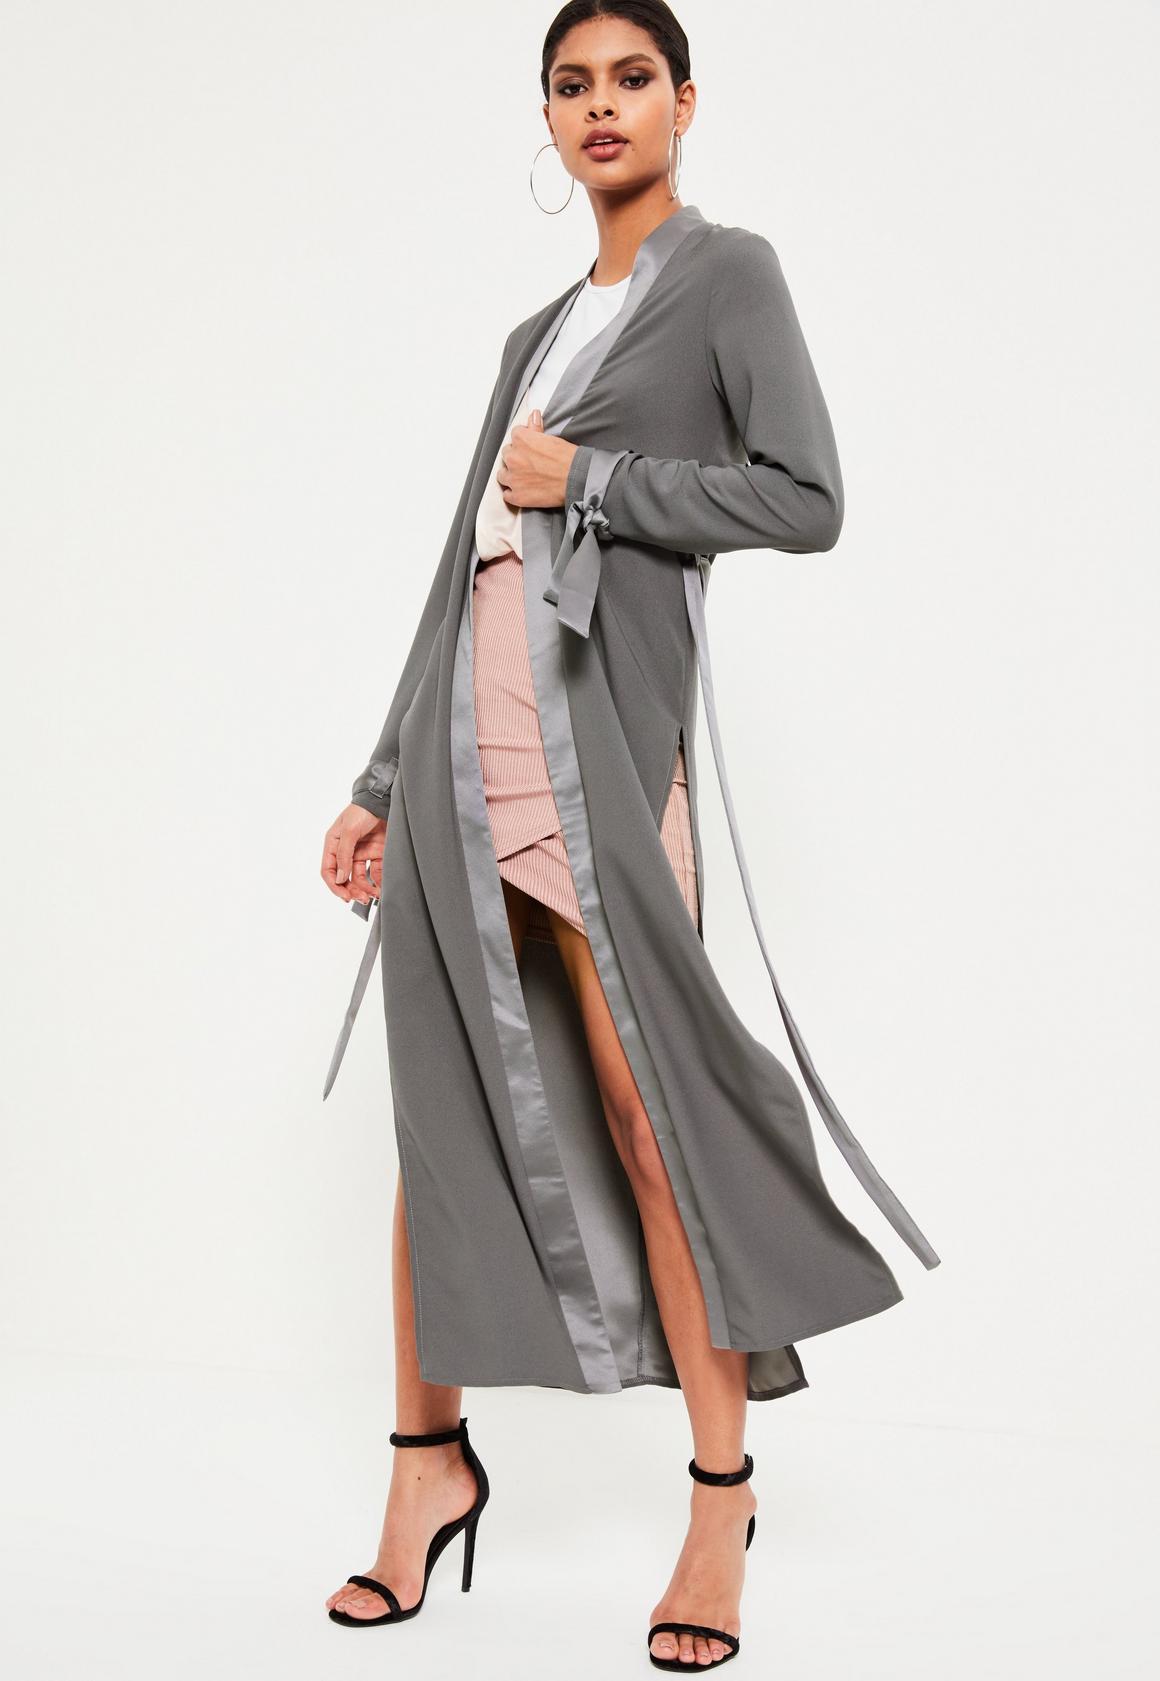 Grey Satin Trim Tie Cuff Duster Coat | Missguided Ireland